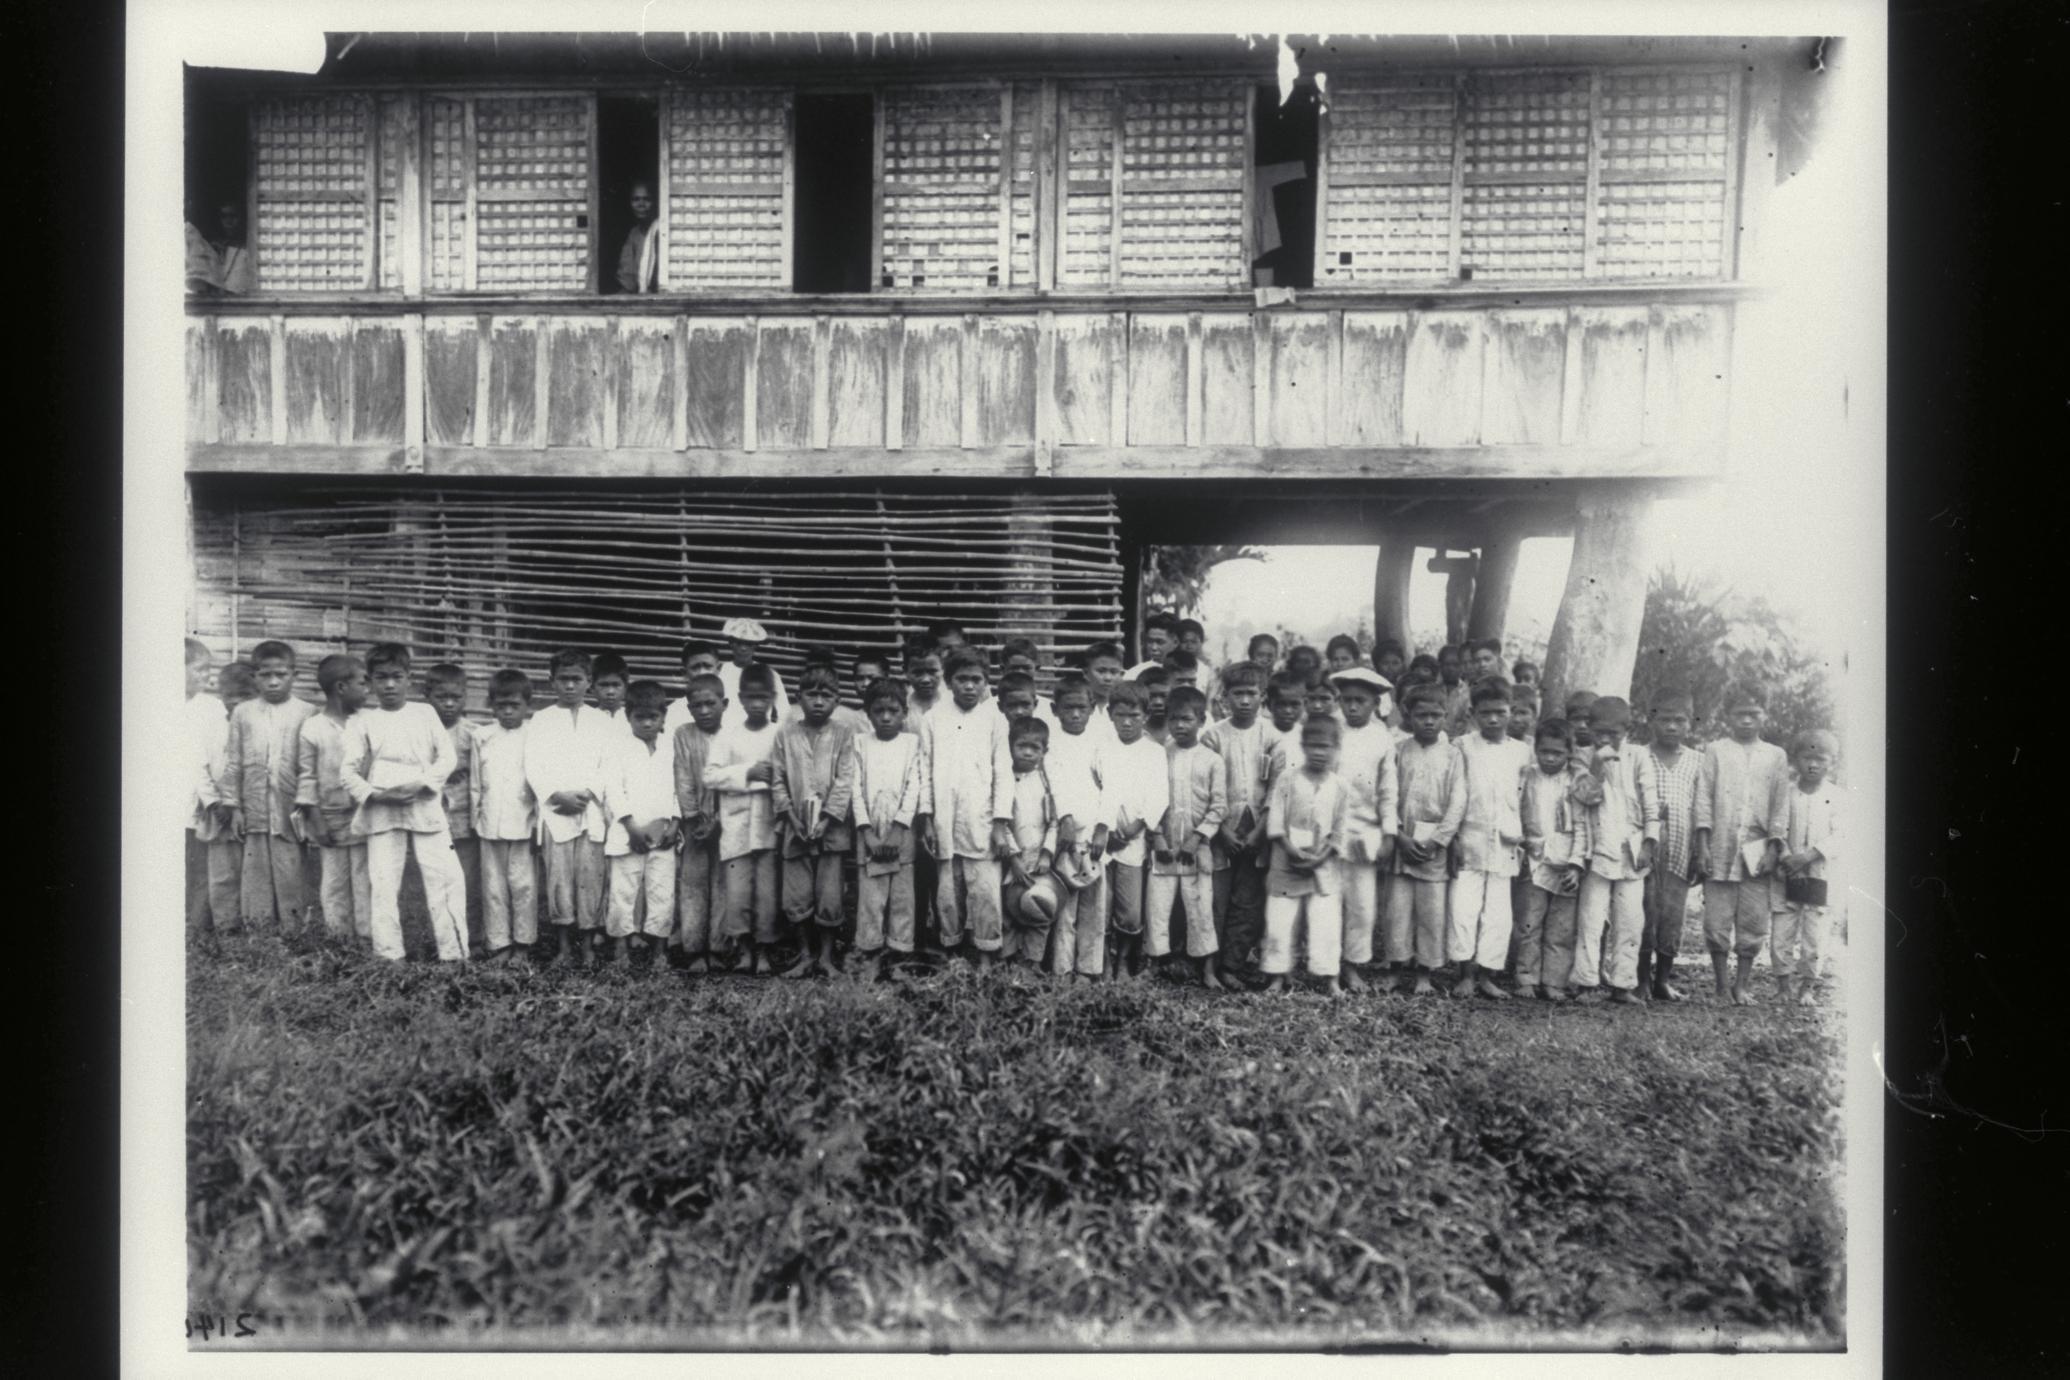 Filipino school children, Bacon, 1901